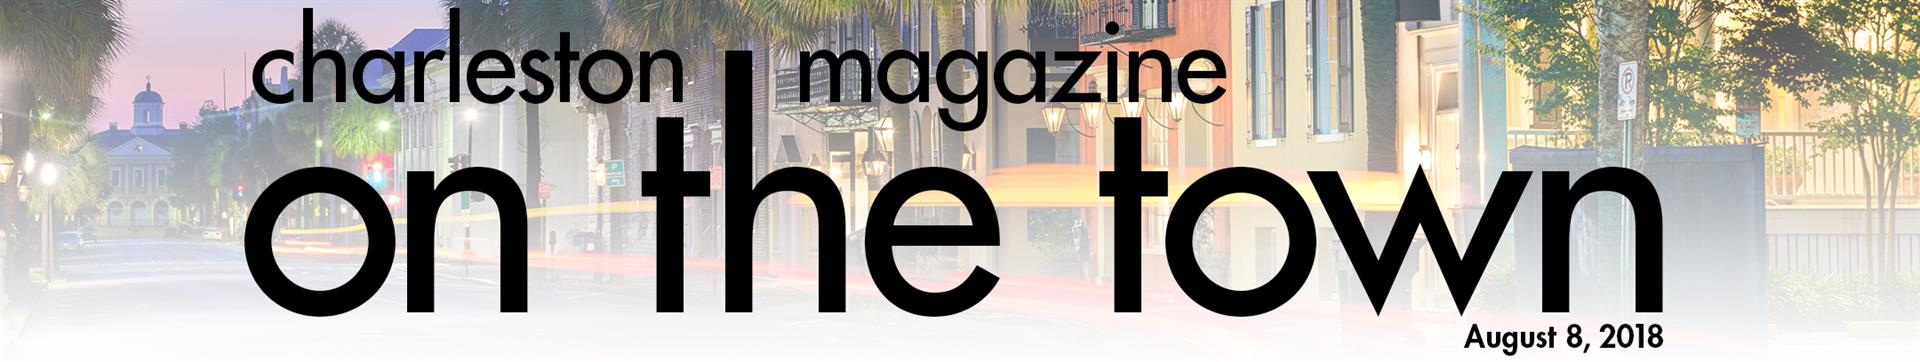 Charleston magazine - On the Town